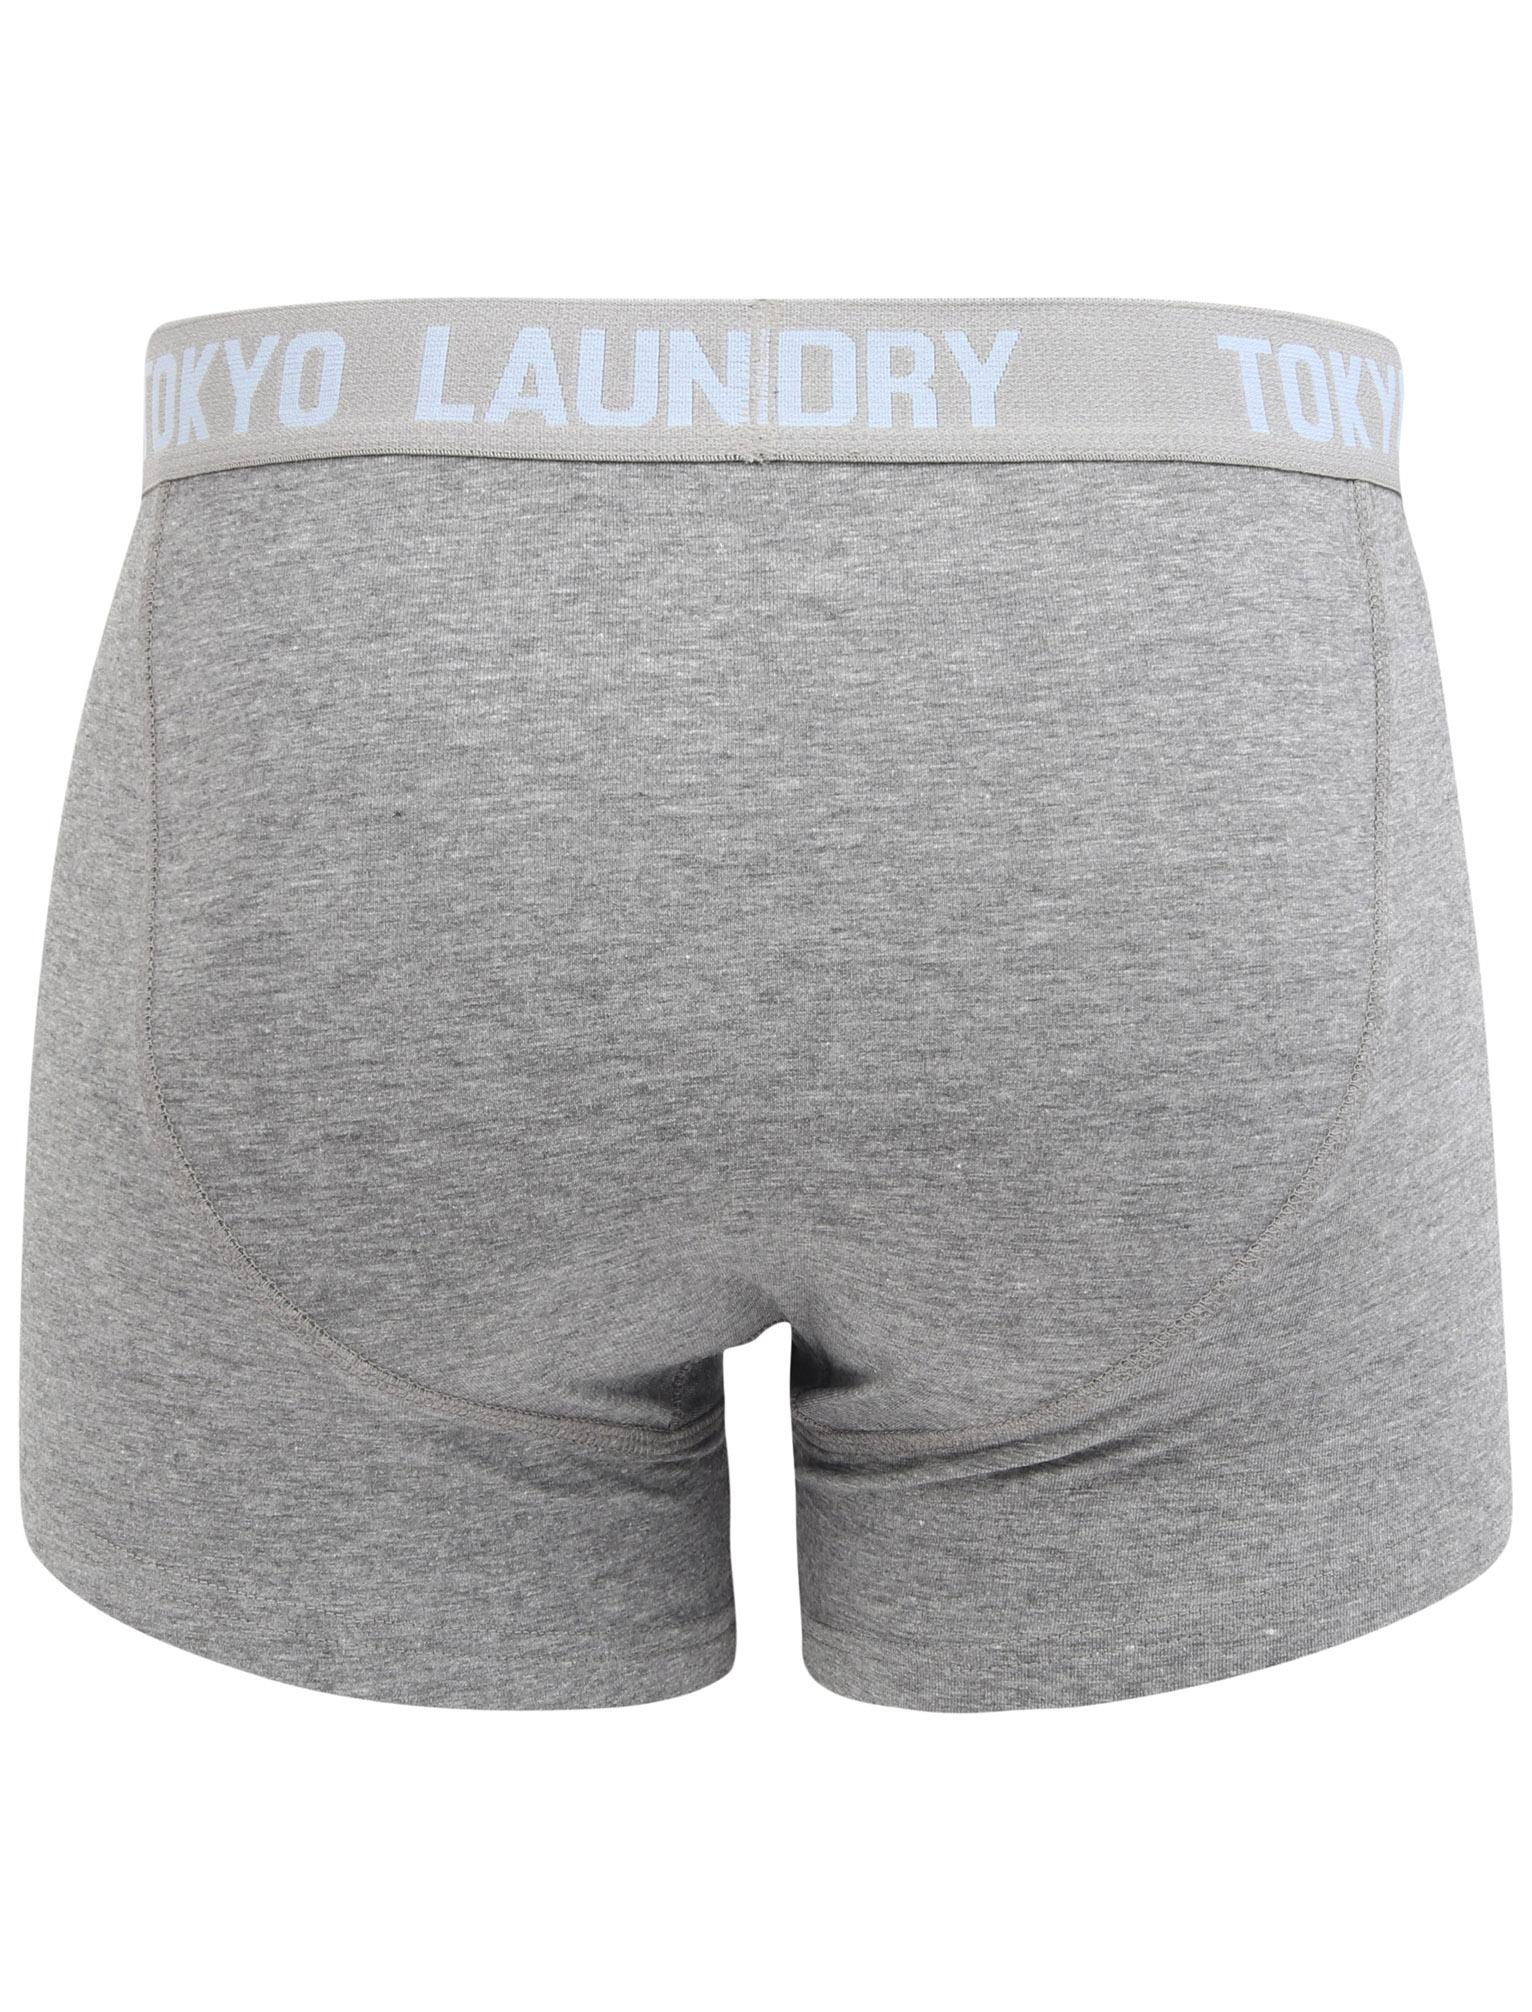 New-Mens-Tokyo-Laundry-2-Pack-Cotton-Rich-Boxer-Shorts-Set-Trunks-Size-S-XXL thumbnail 24